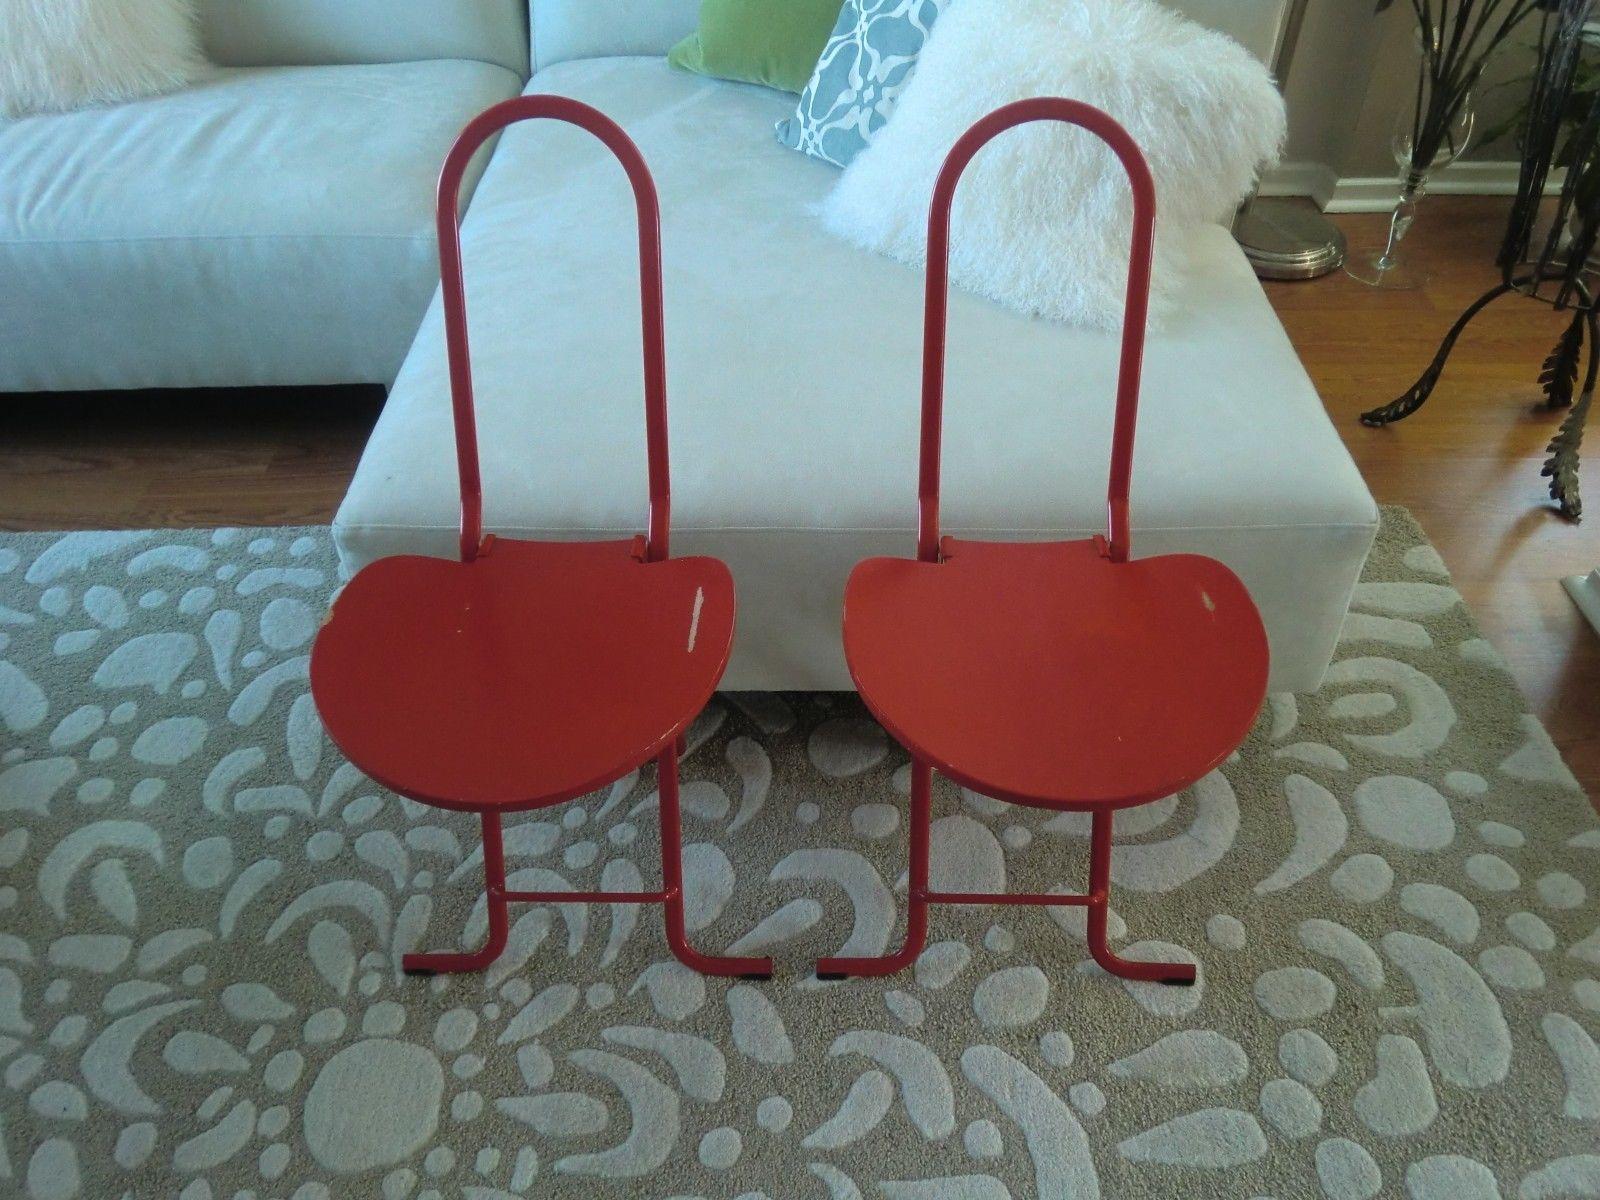 Thema Sedie E Tavoli.Vintage Gastone Rinaldi Dafne Folding Chairs 2 Red Thema Of Italy